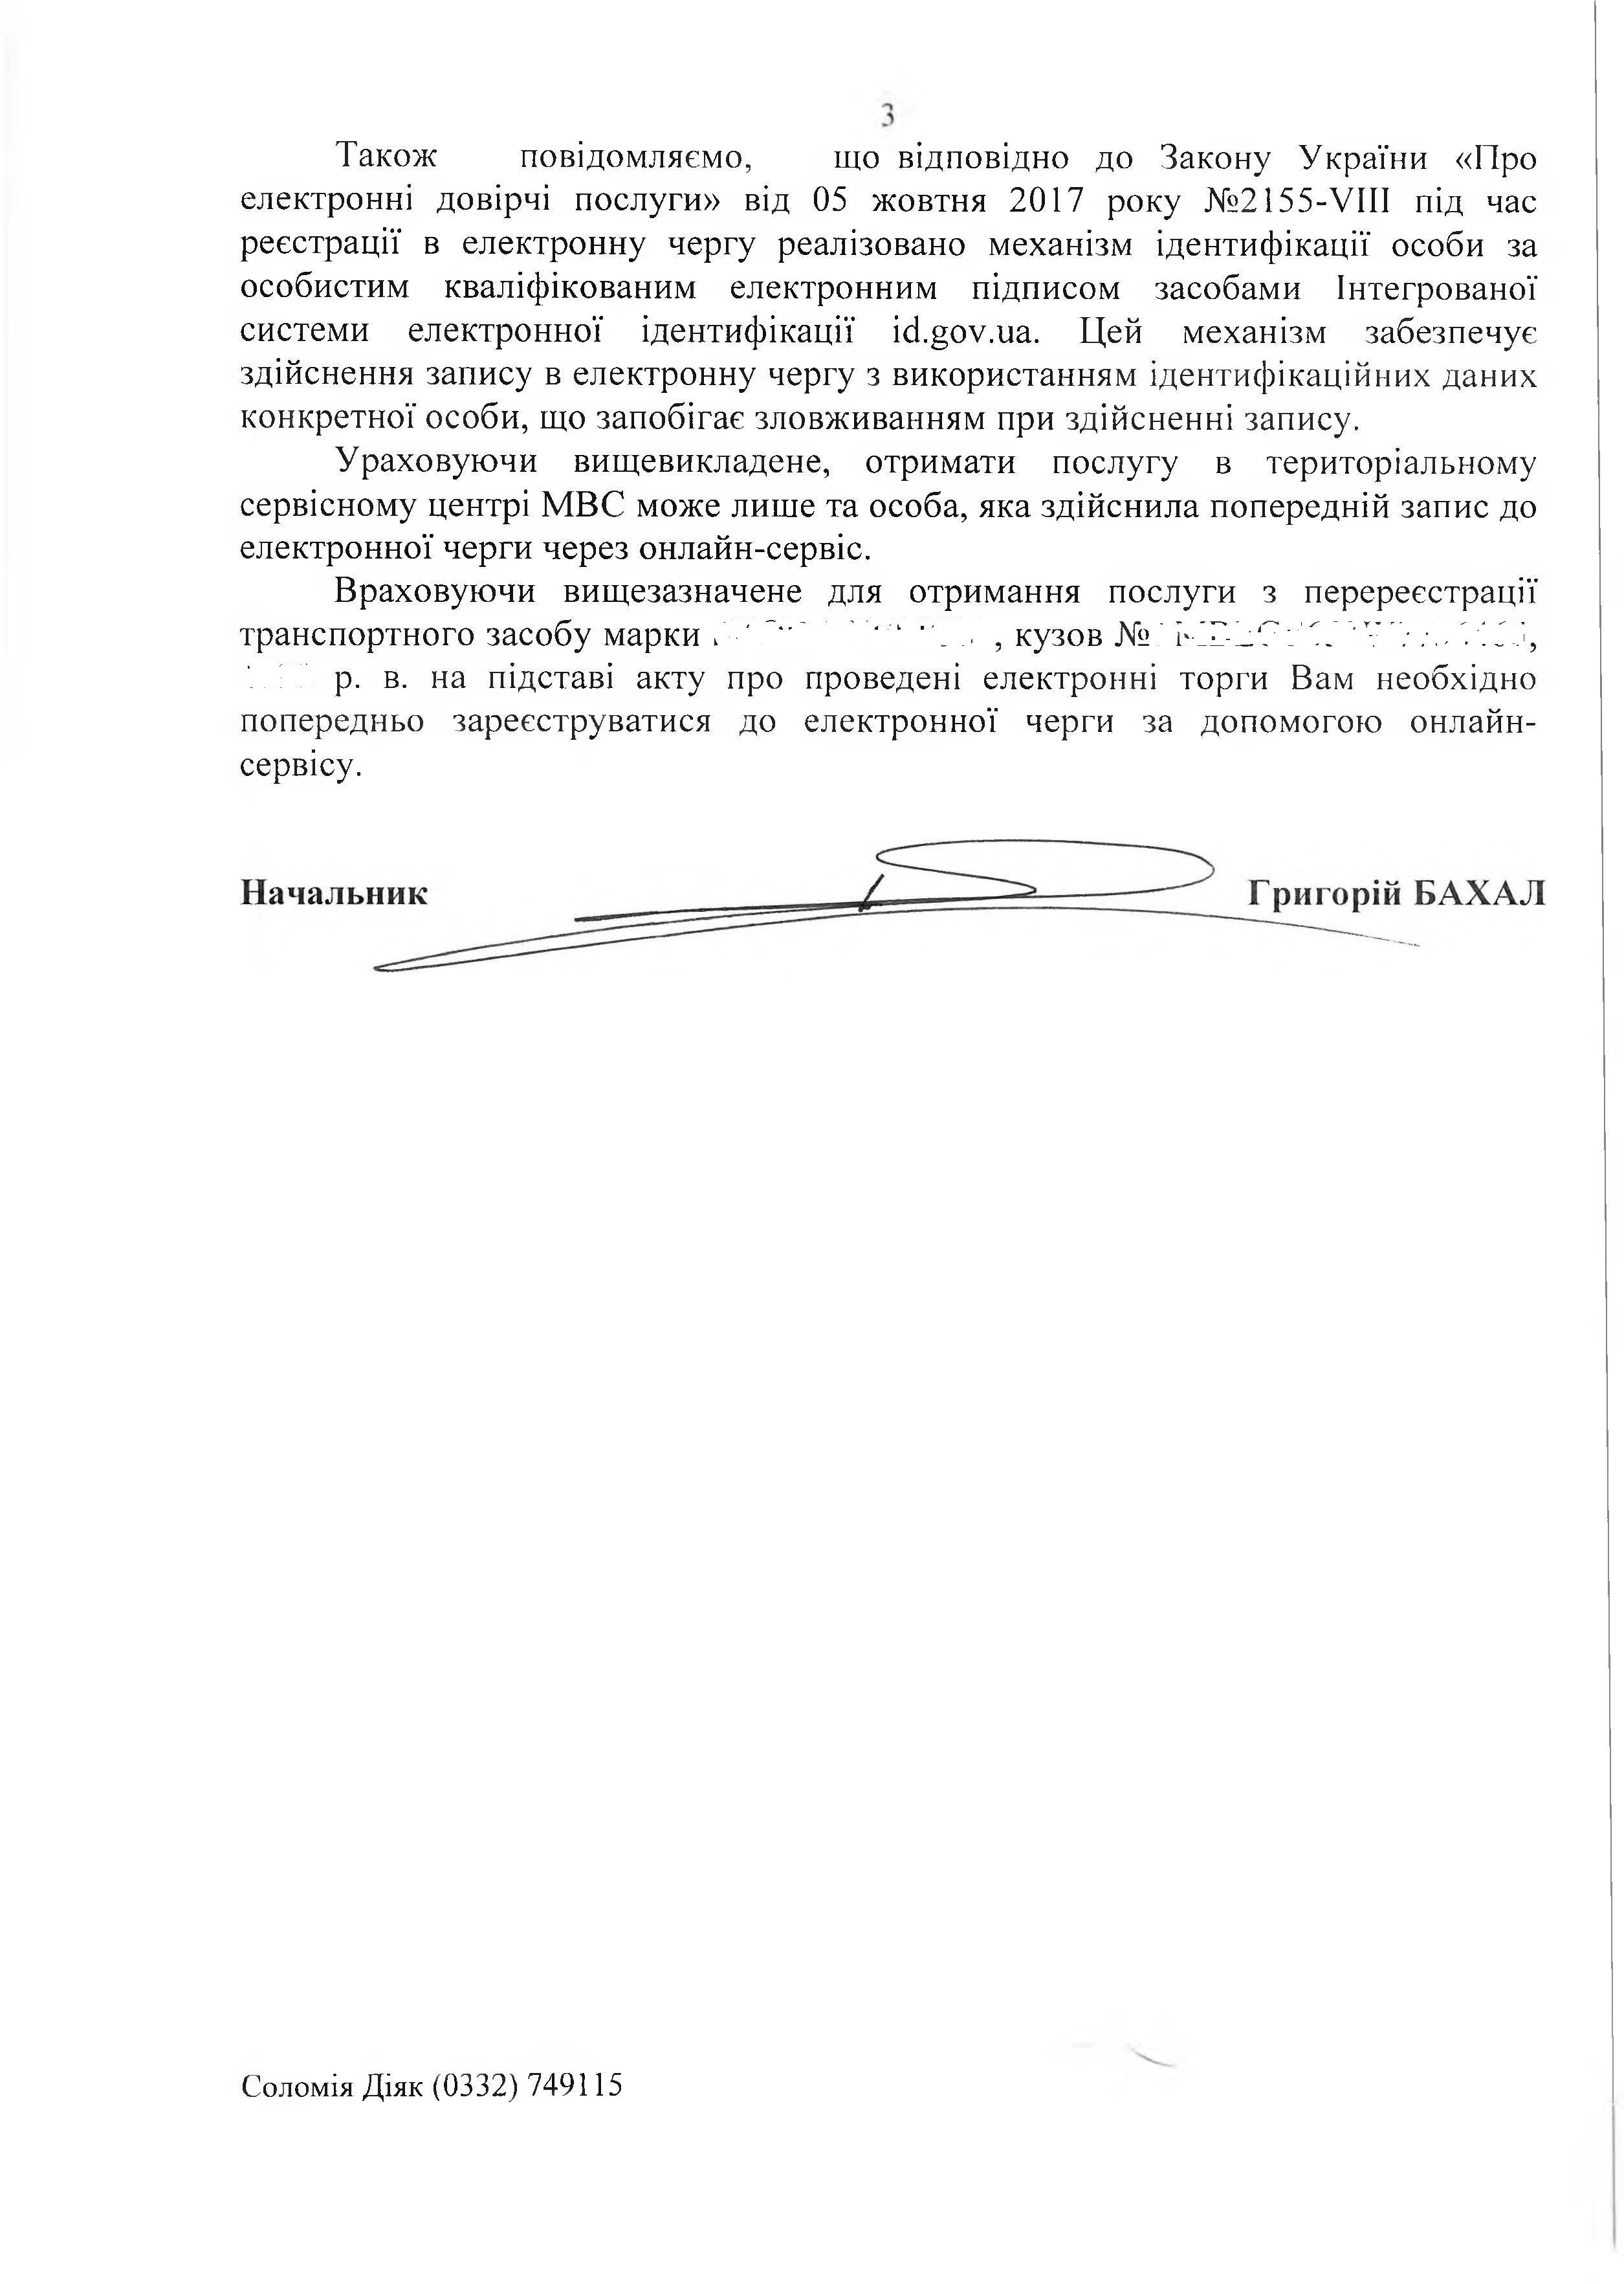 image http://forum.setam.net.ua/assets/images/446-HBQYSzv17egXF7A3.jpeg